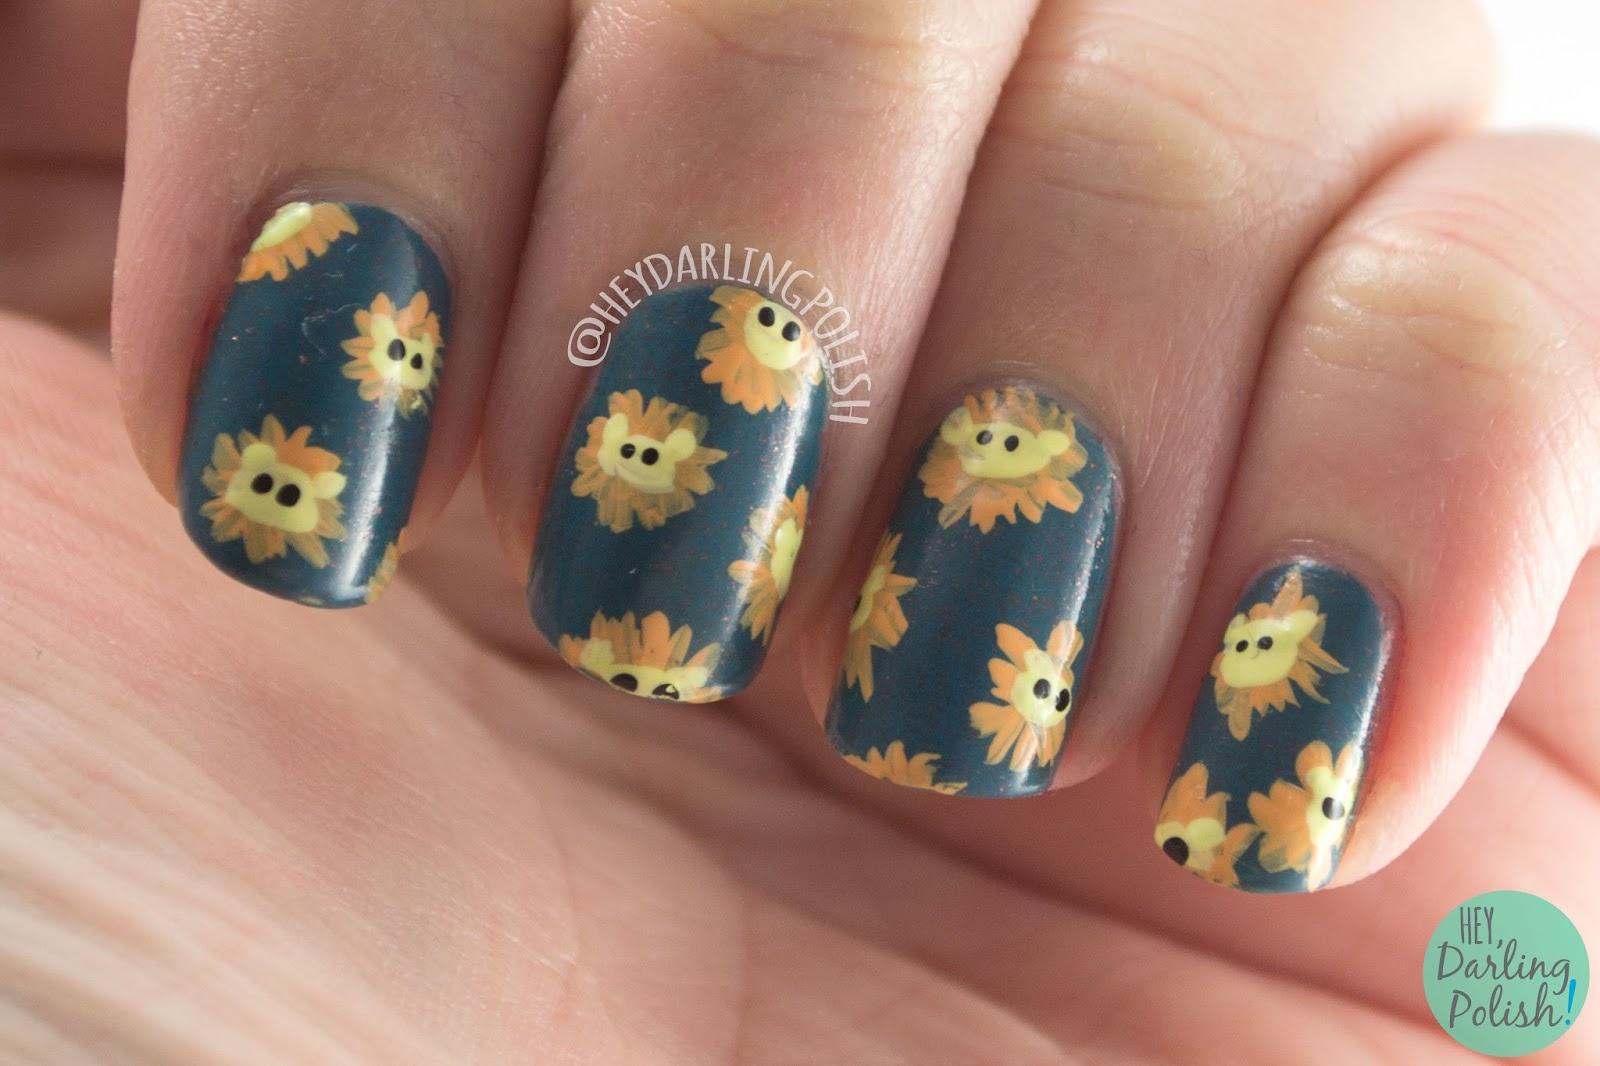 Hey, Darling Polish!: The Nail Challenge Collaborative: Animals - #3